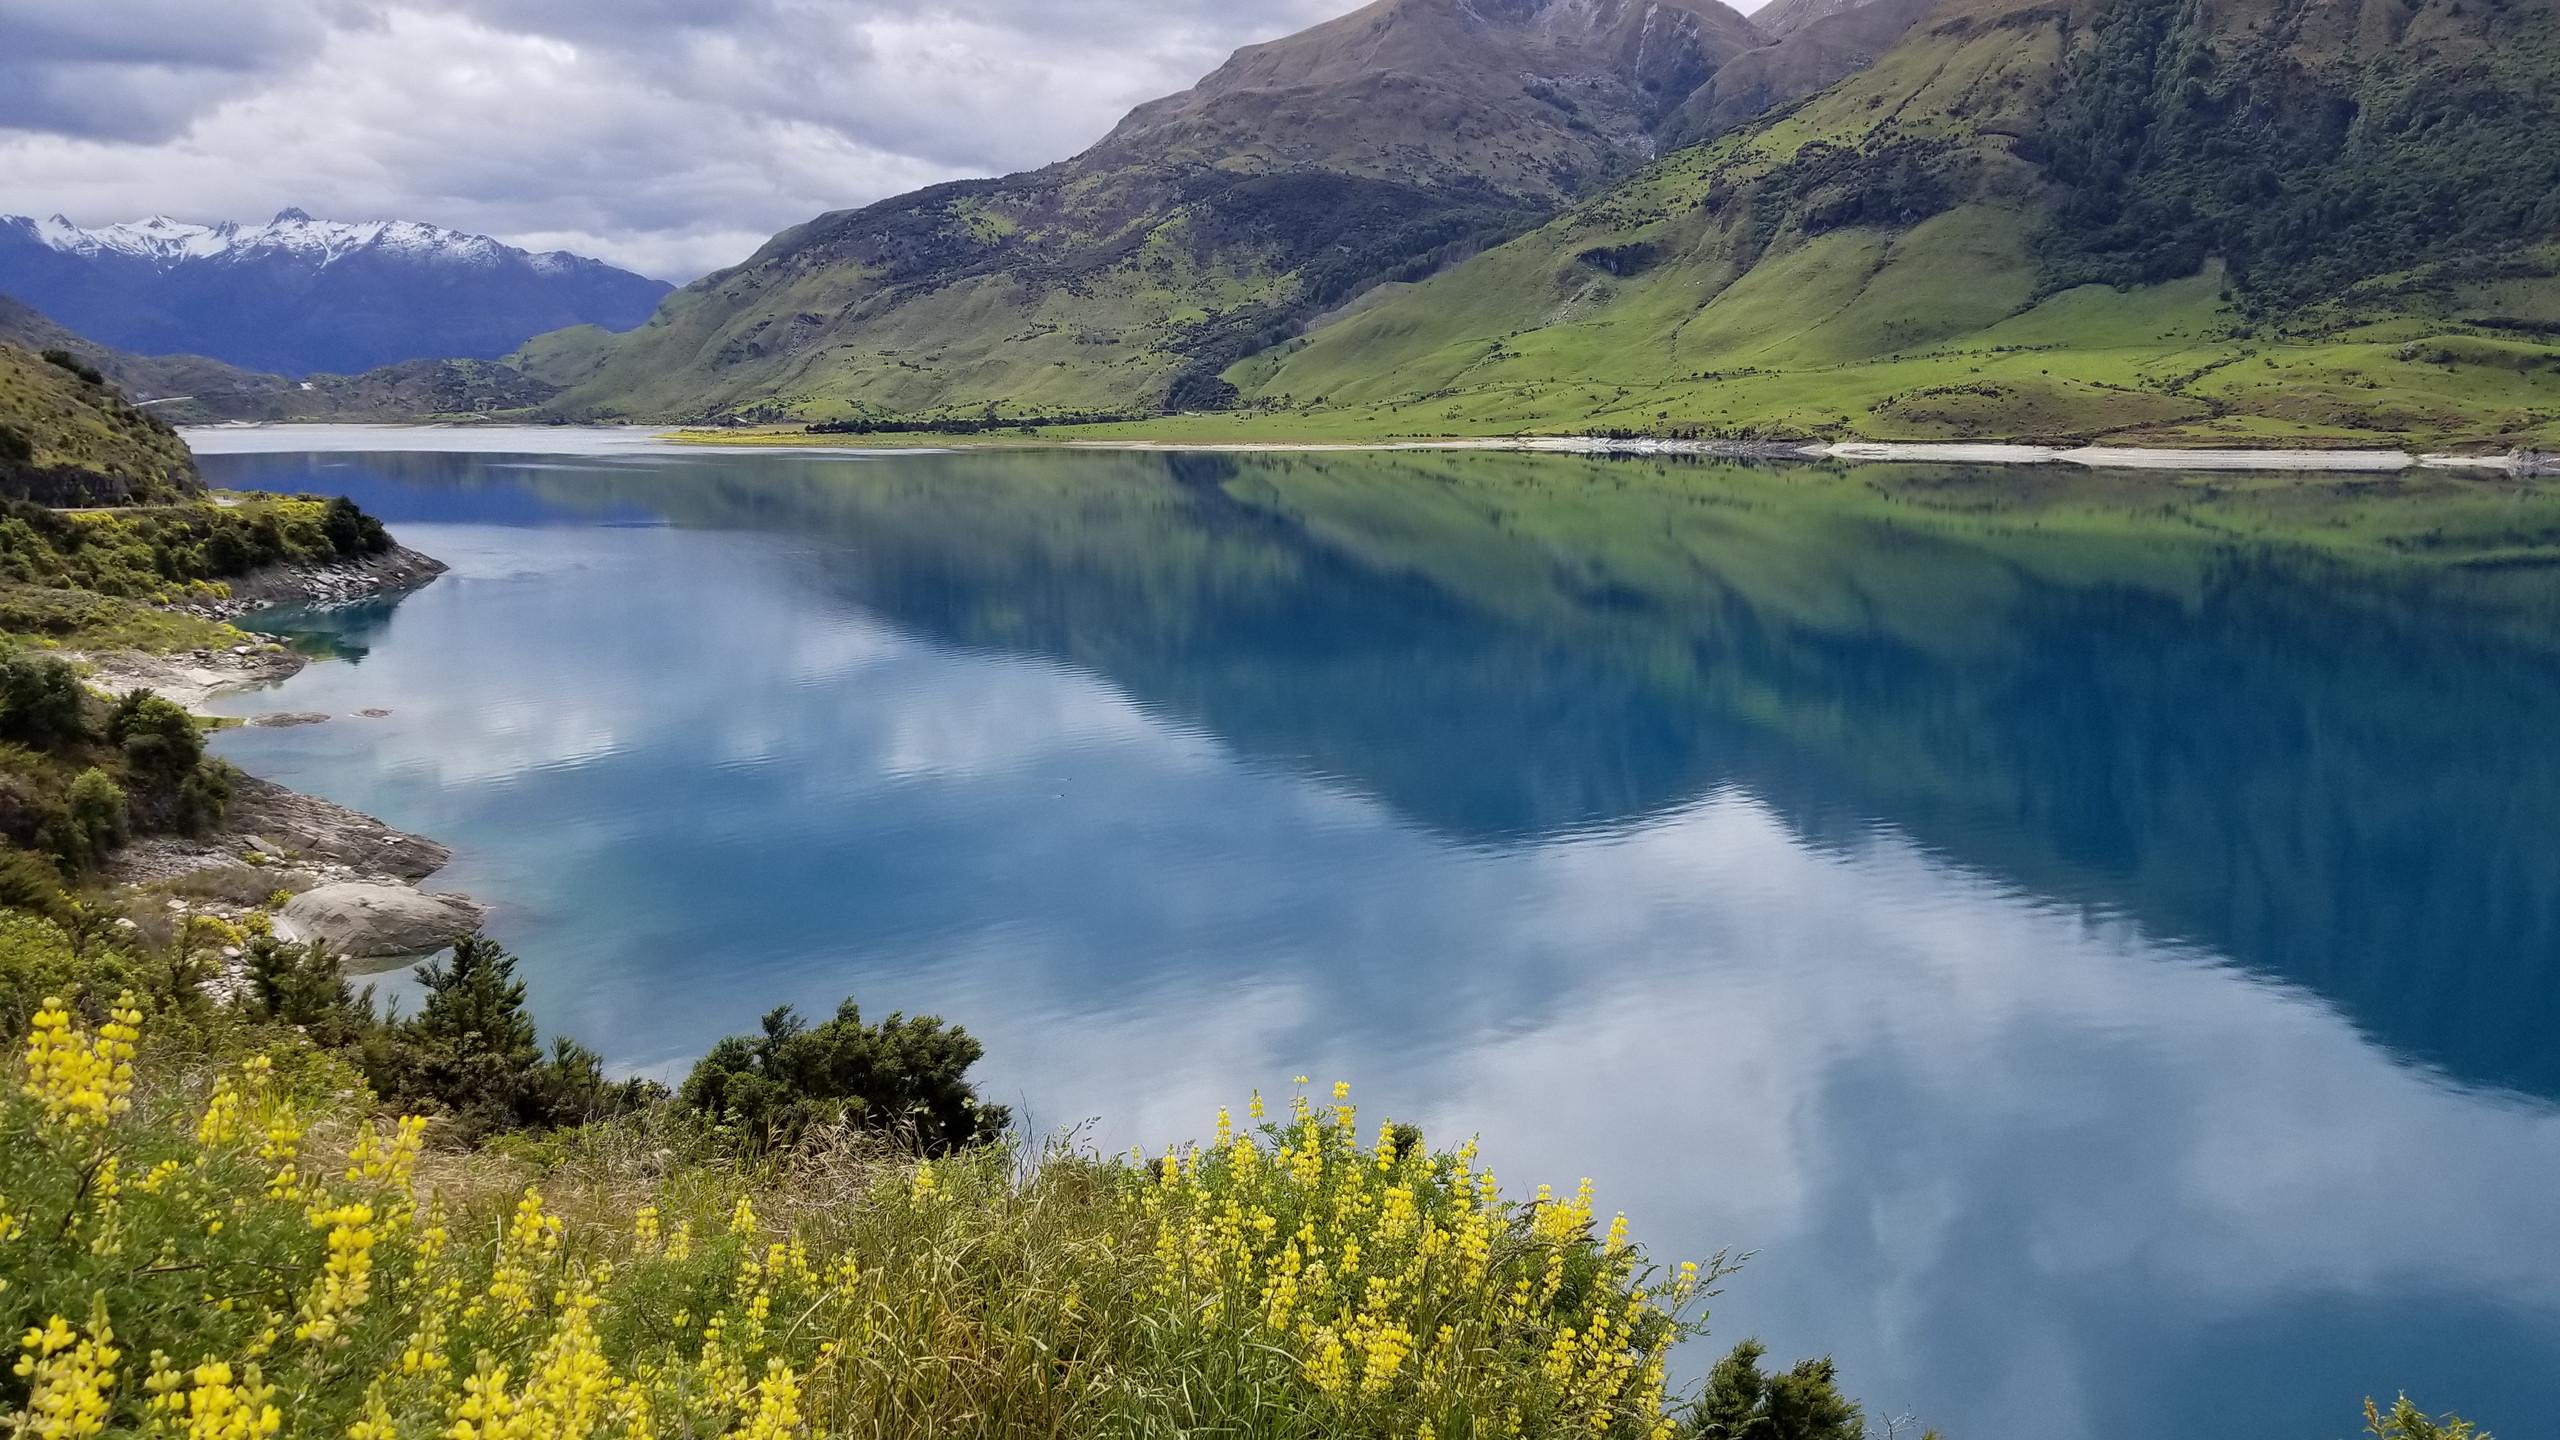 Hawea lake, New Zealand activities, New Zealand tours